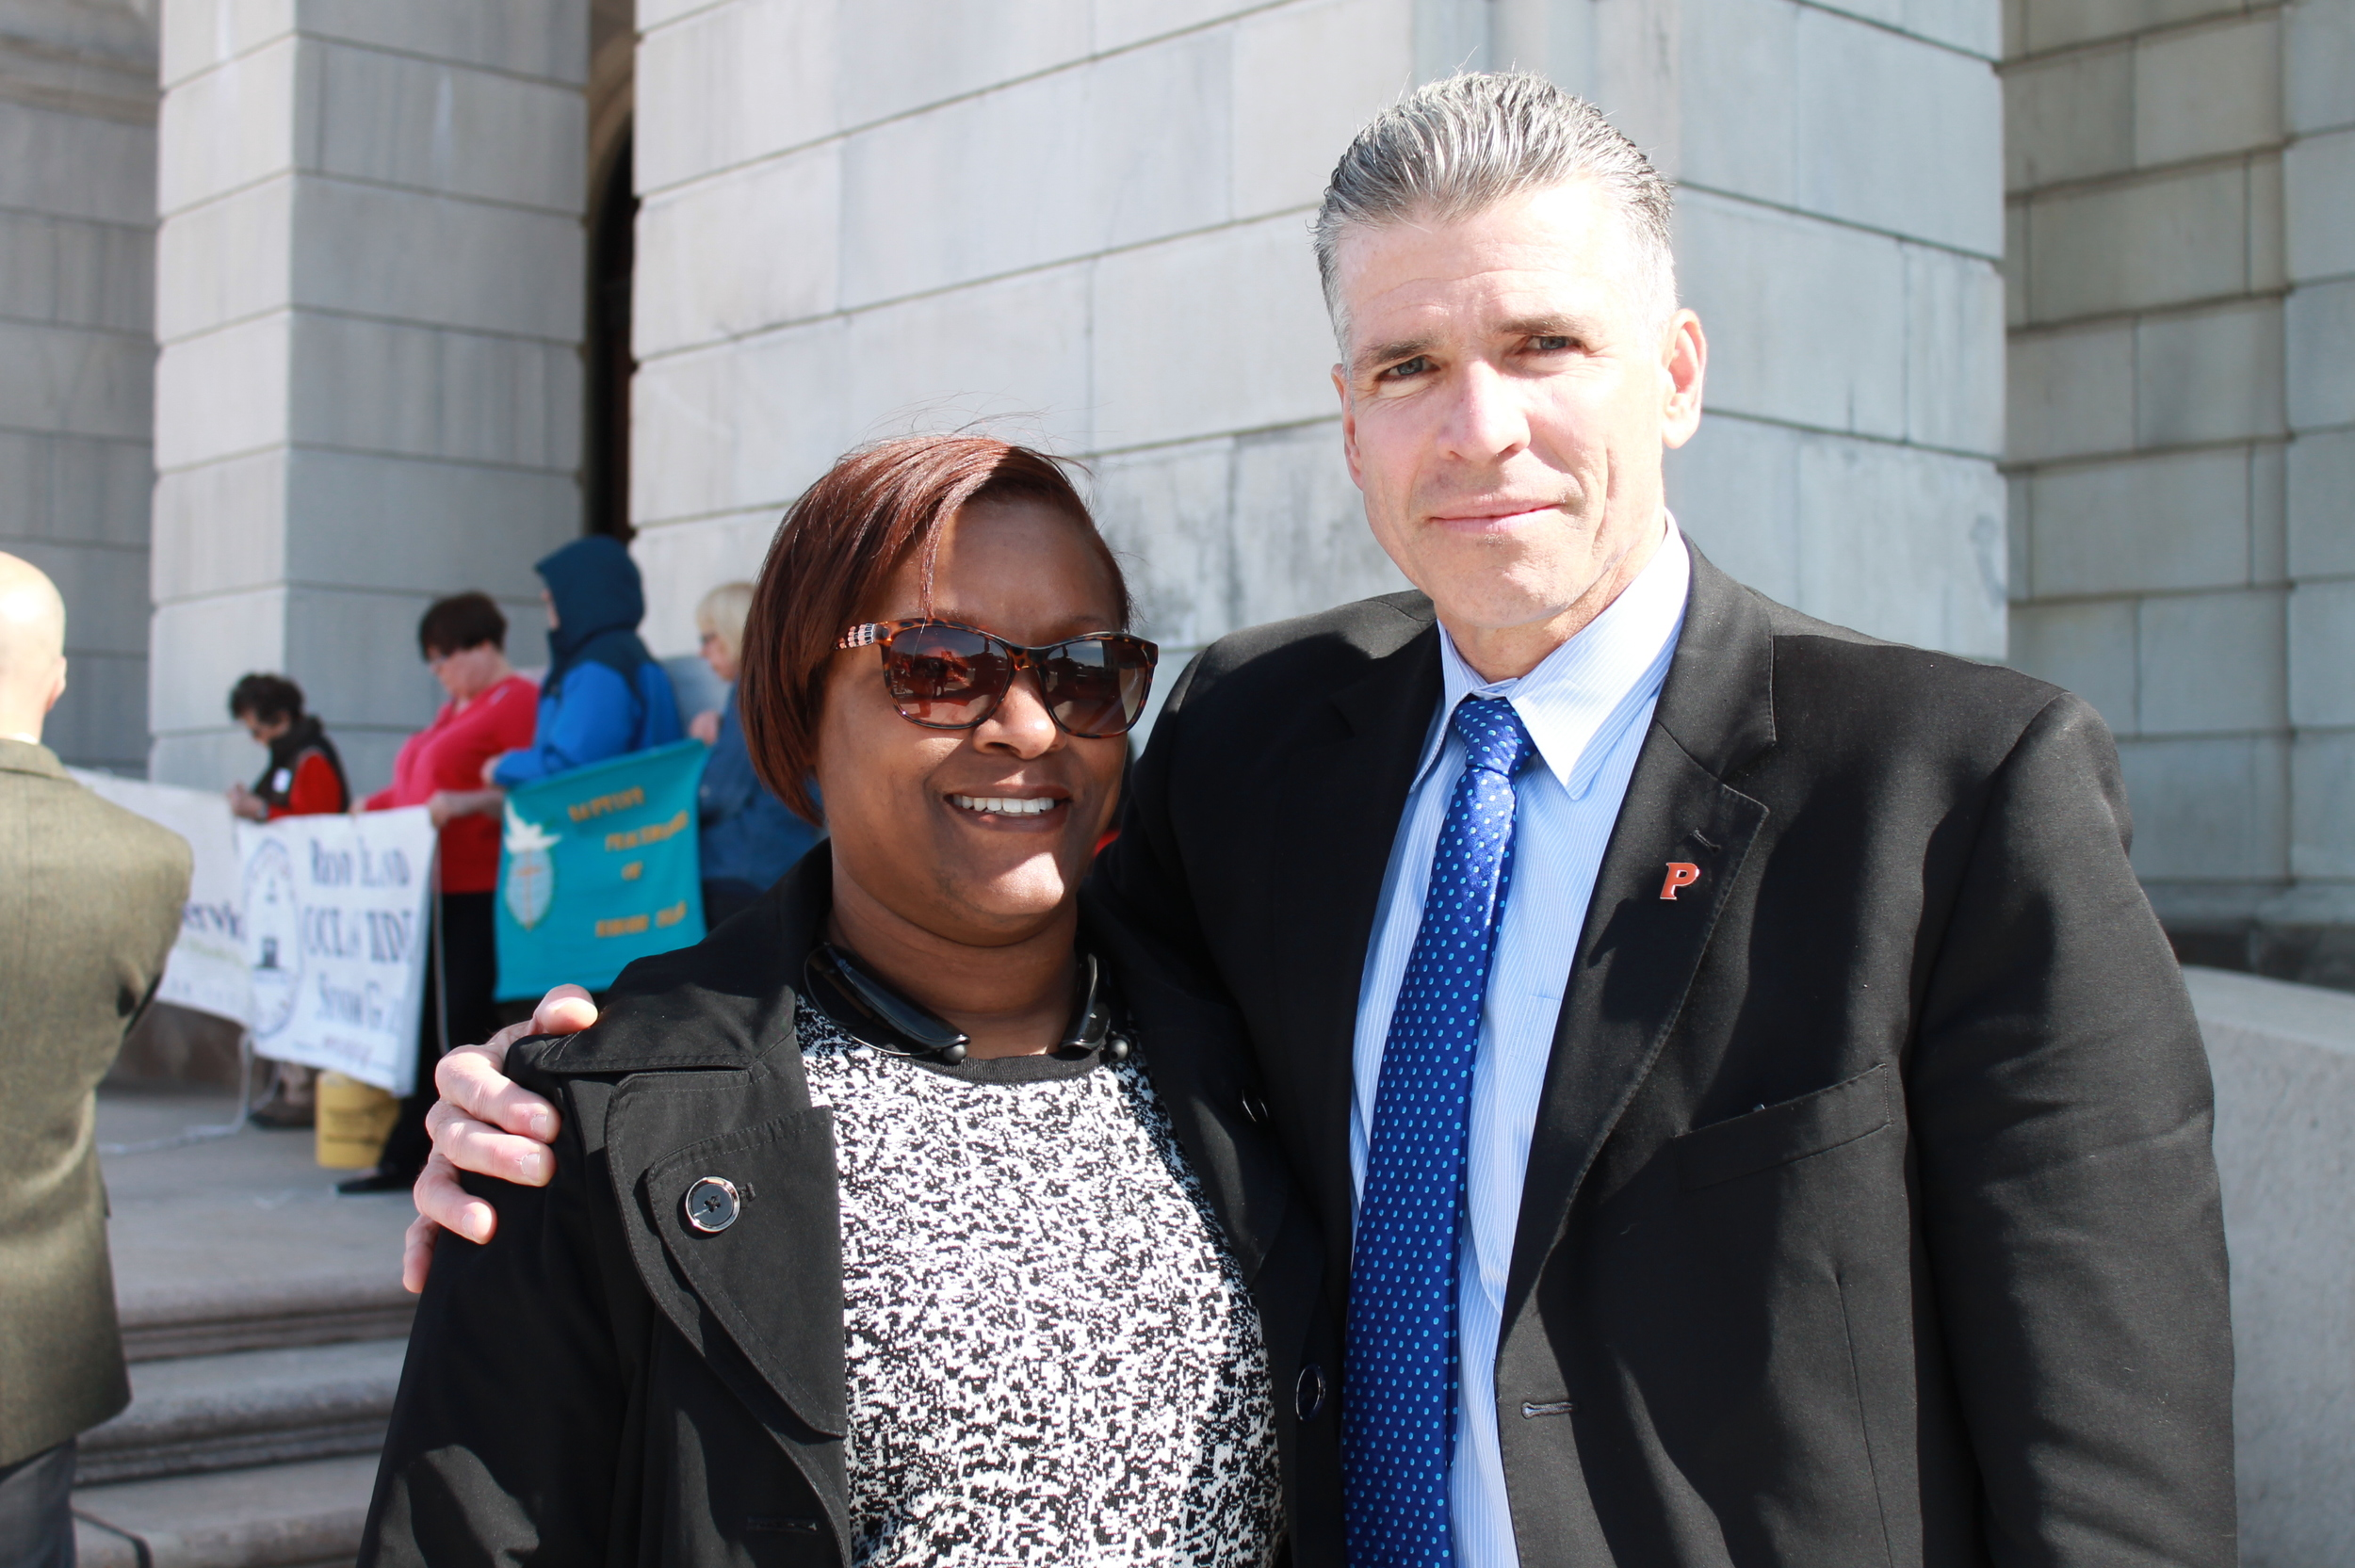 Myra & Commissioner Pare2.JPG